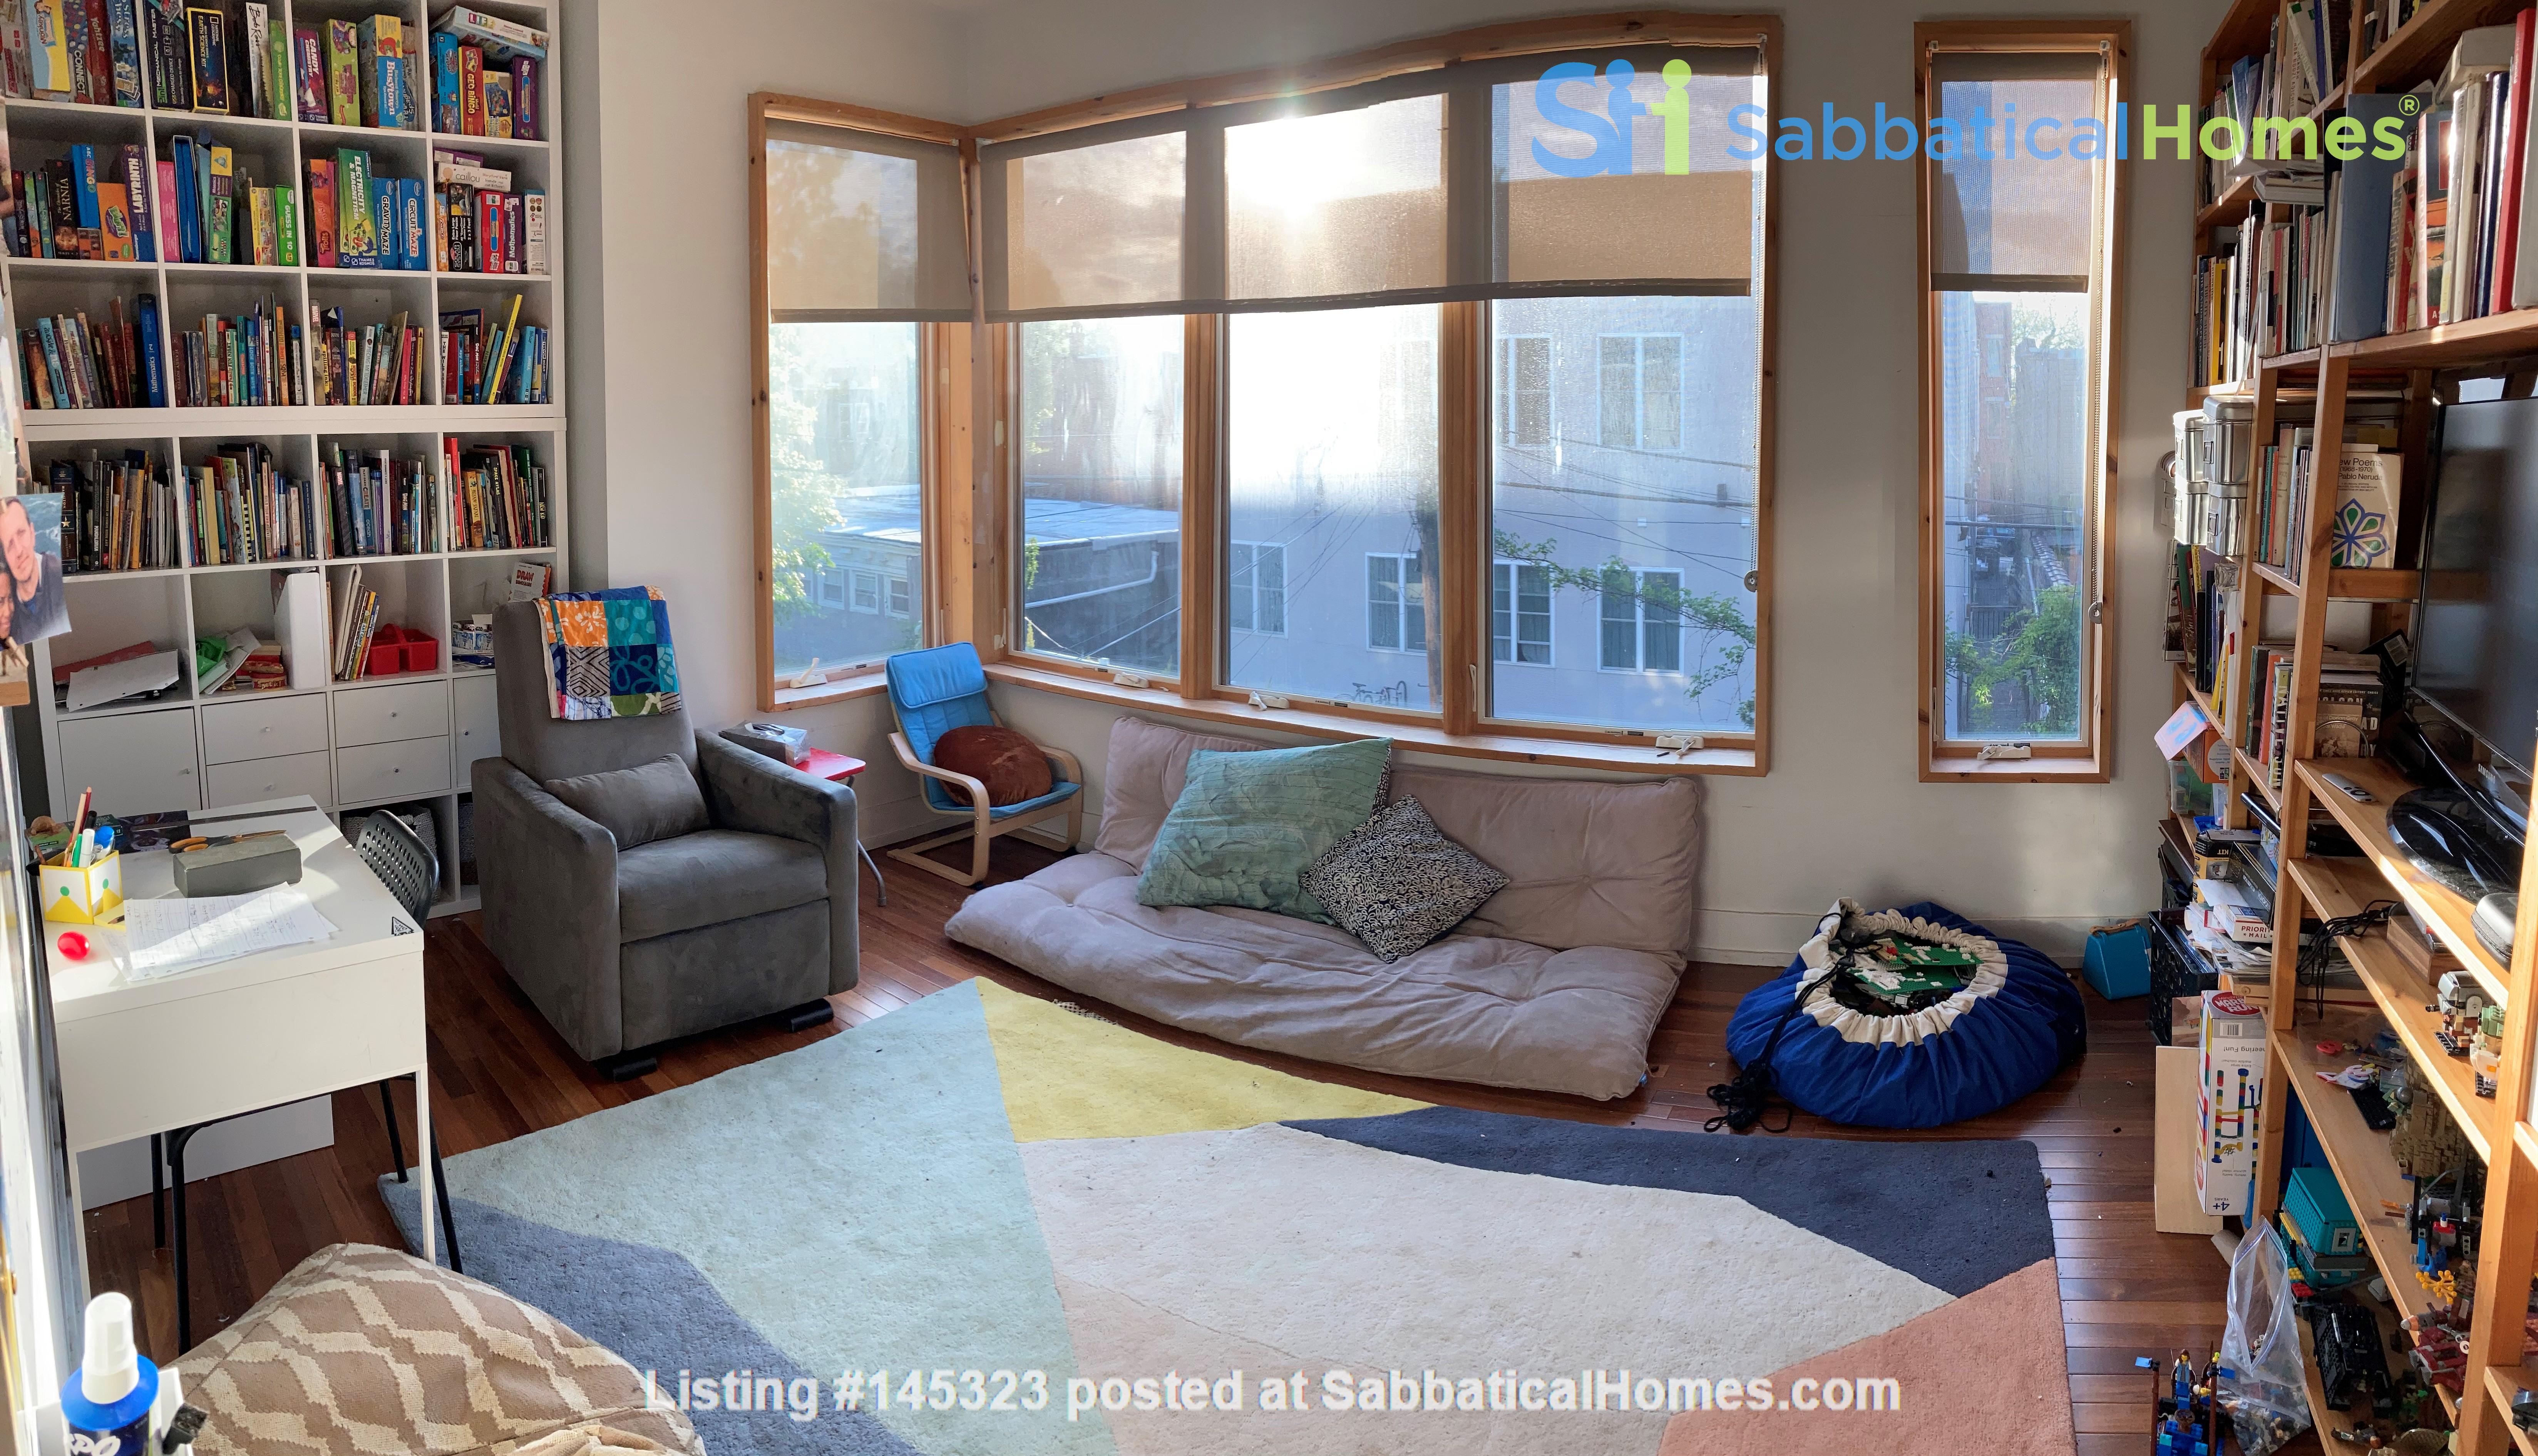 Modern 3 bedroom home Home Rental in Philadelphia, Pennsylvania, United States 4